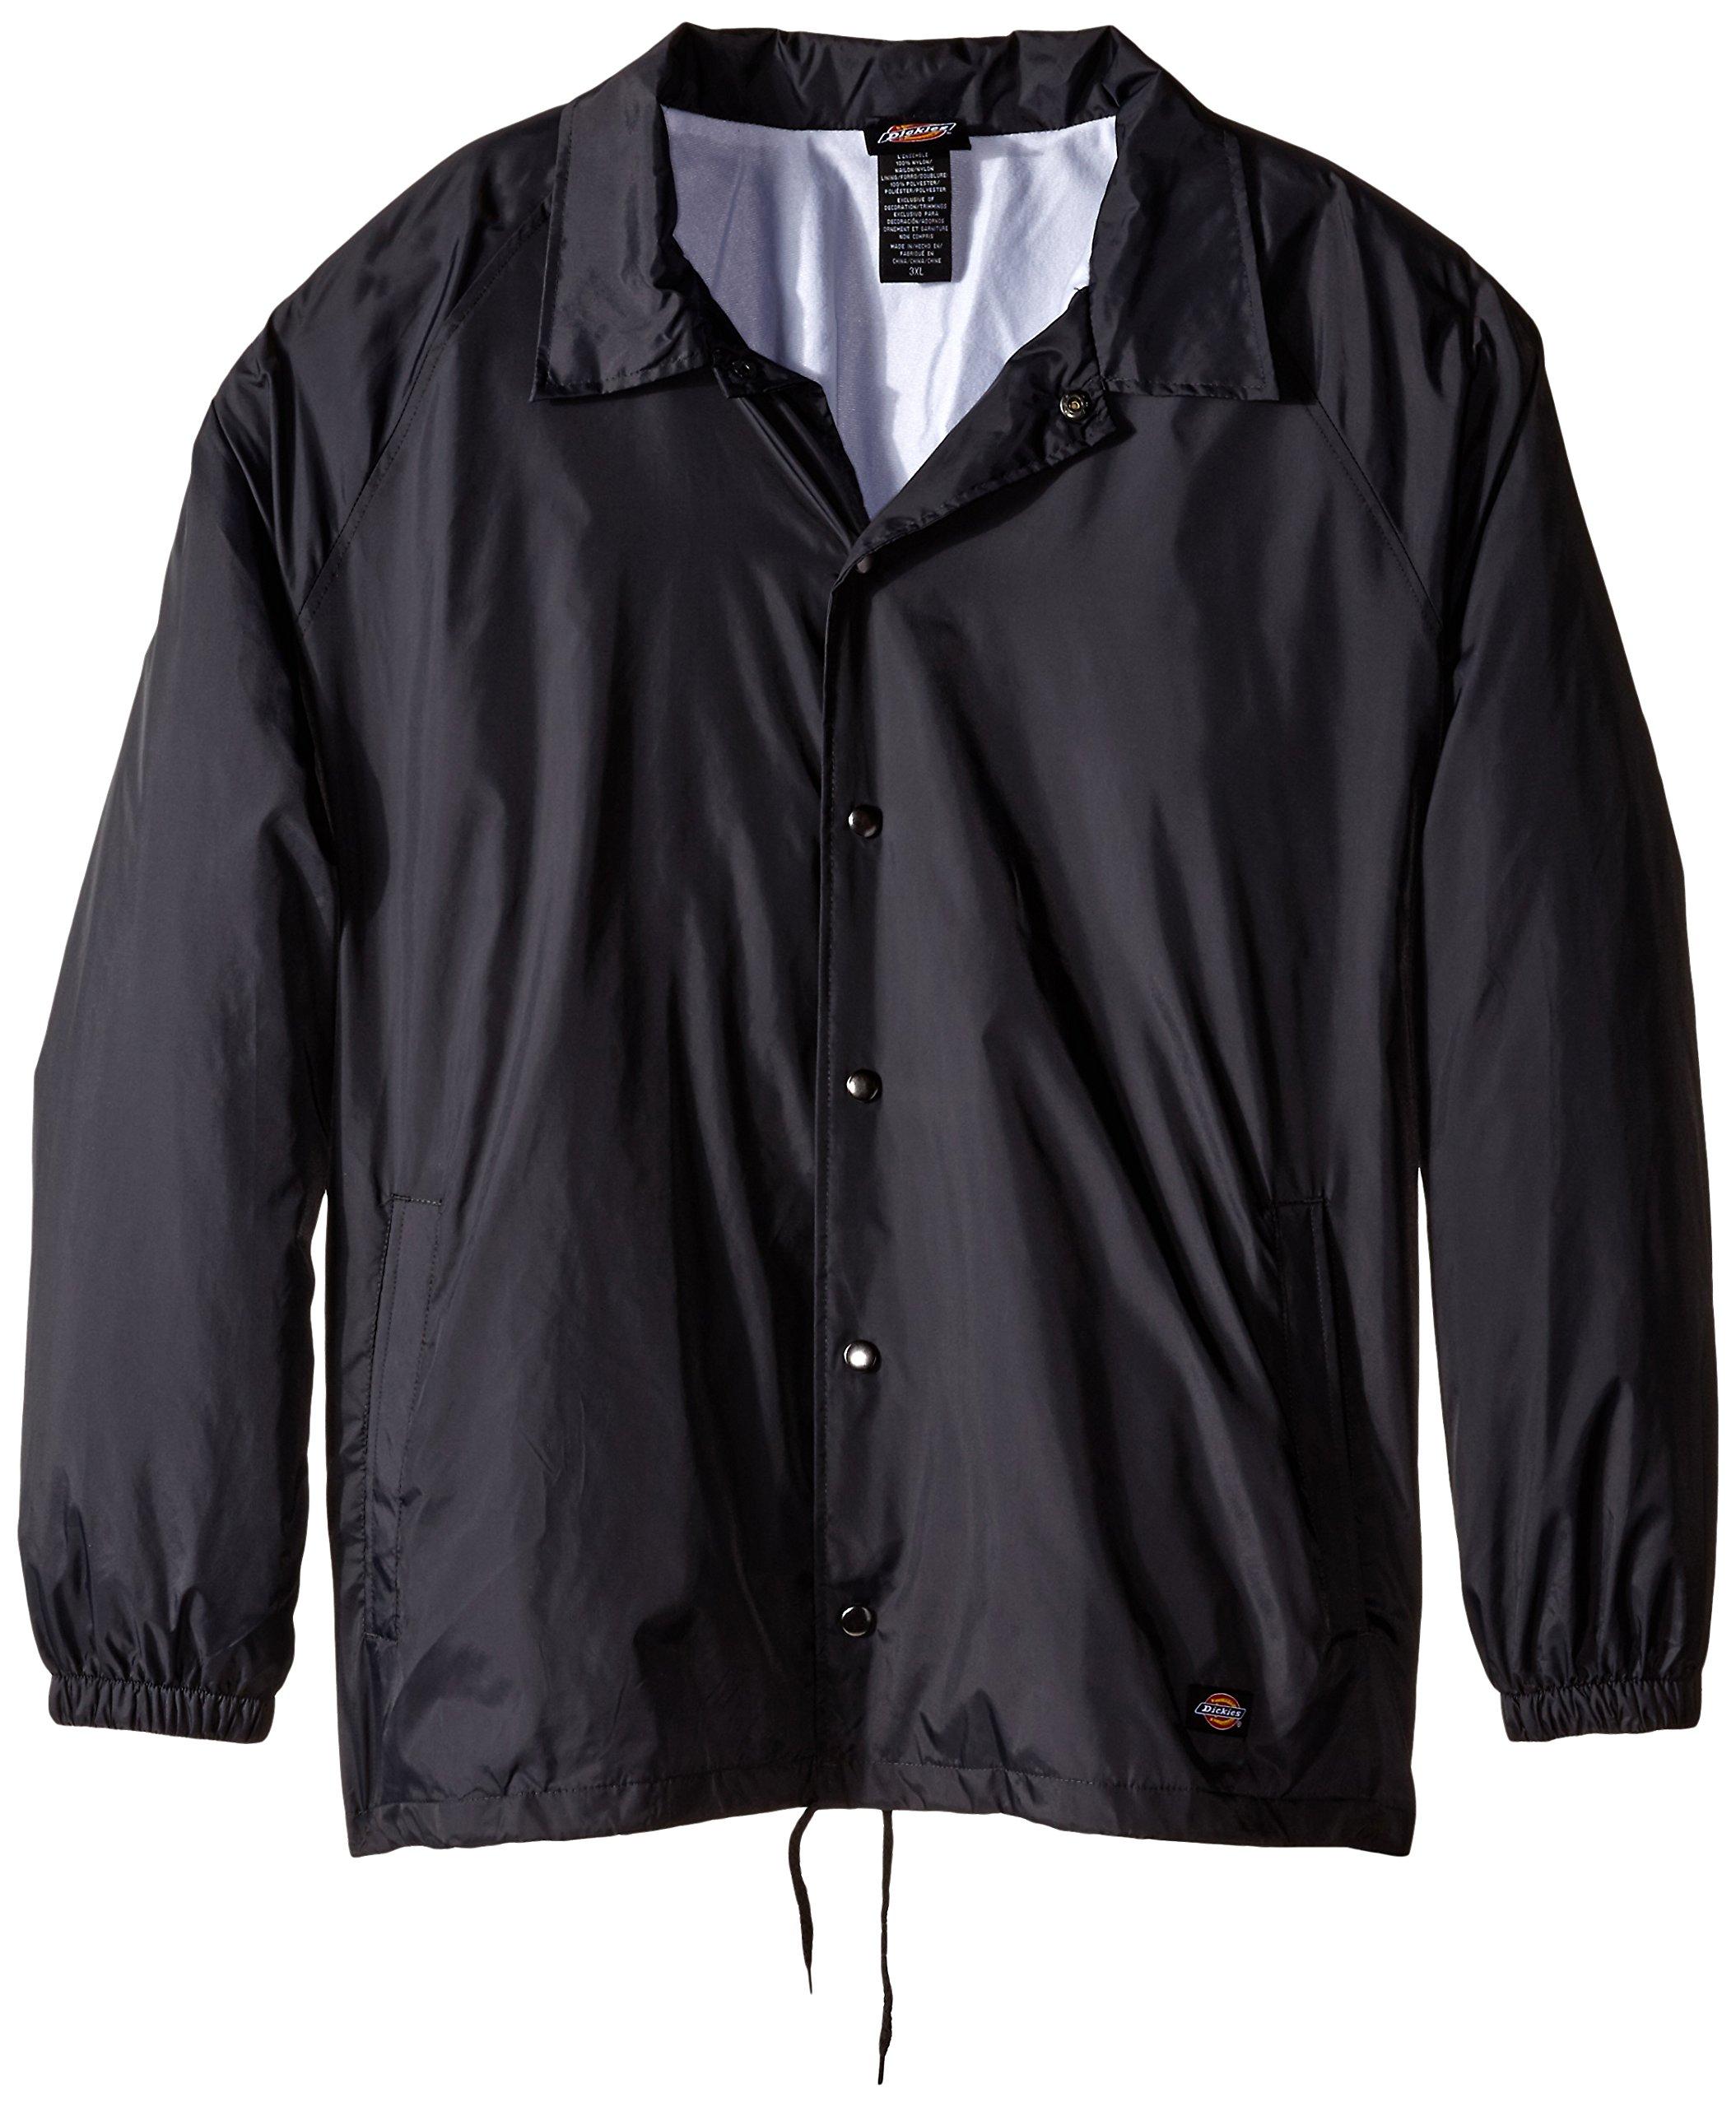 Dickies Men's Big Snap Front Nylon Jacket, Charcoal, 5X